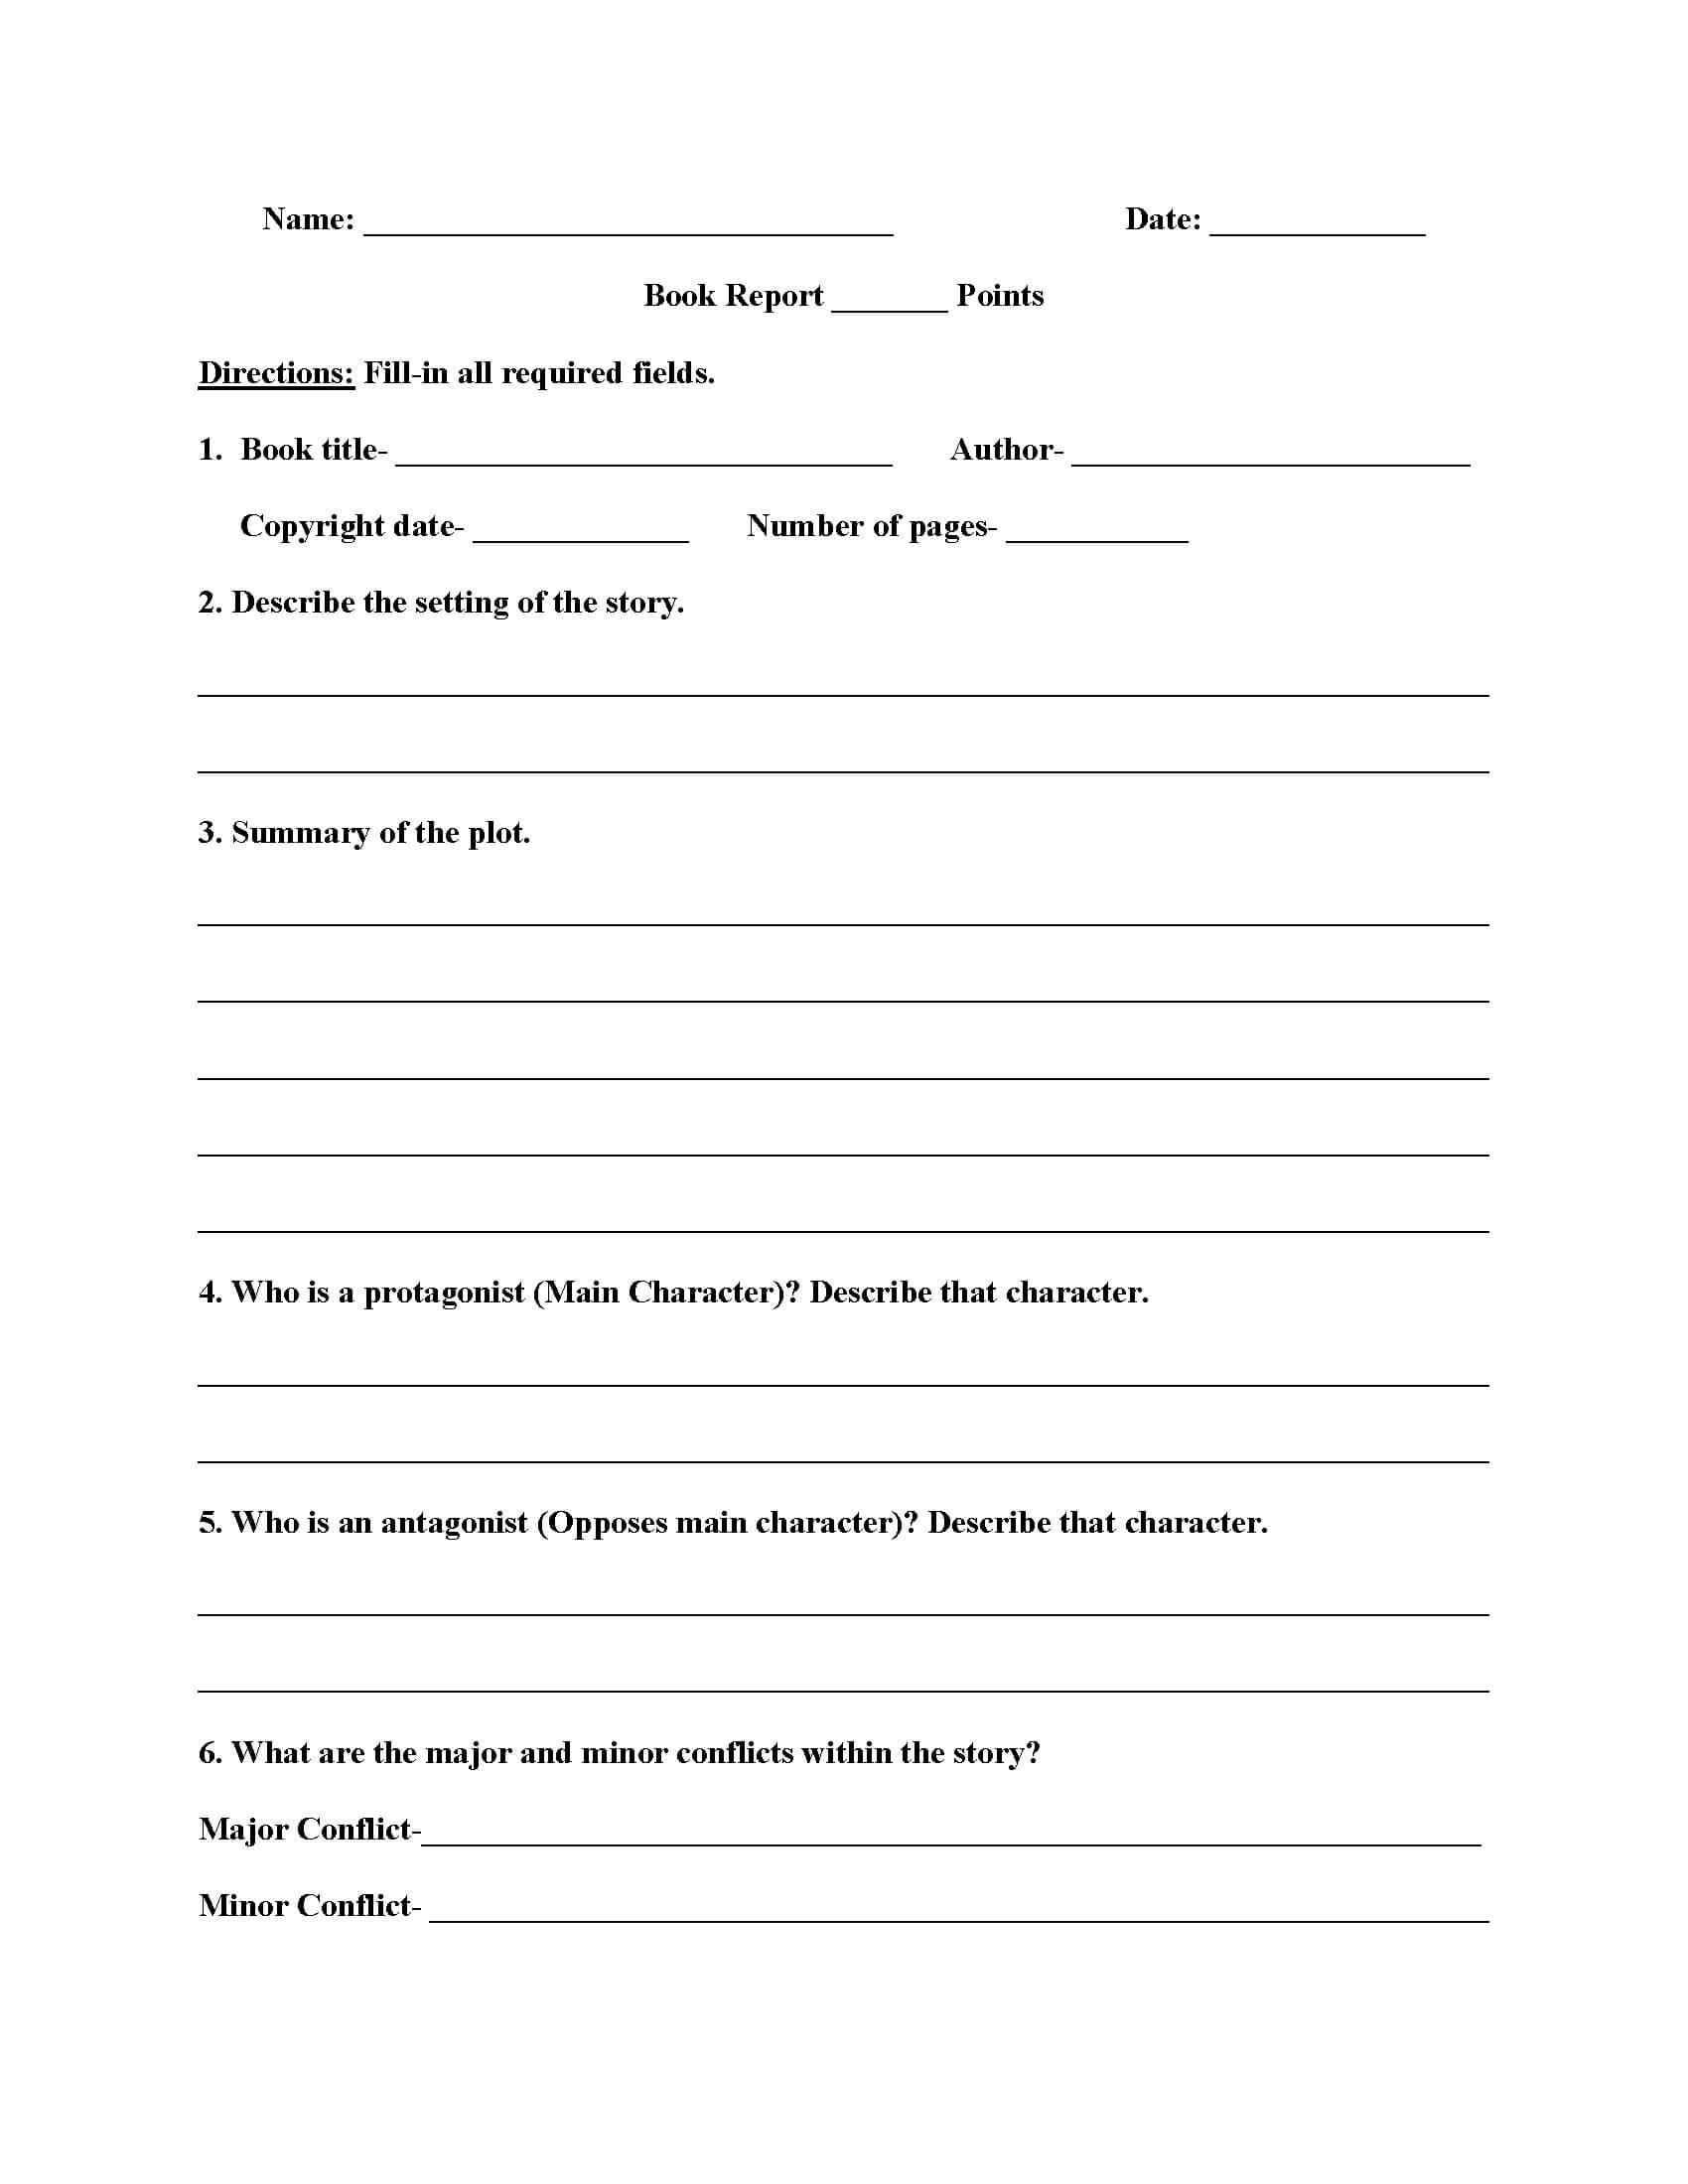 011 Template Ideas 6Th Grade Book Report High Non Fiction For 6Th Grade Book Report Template